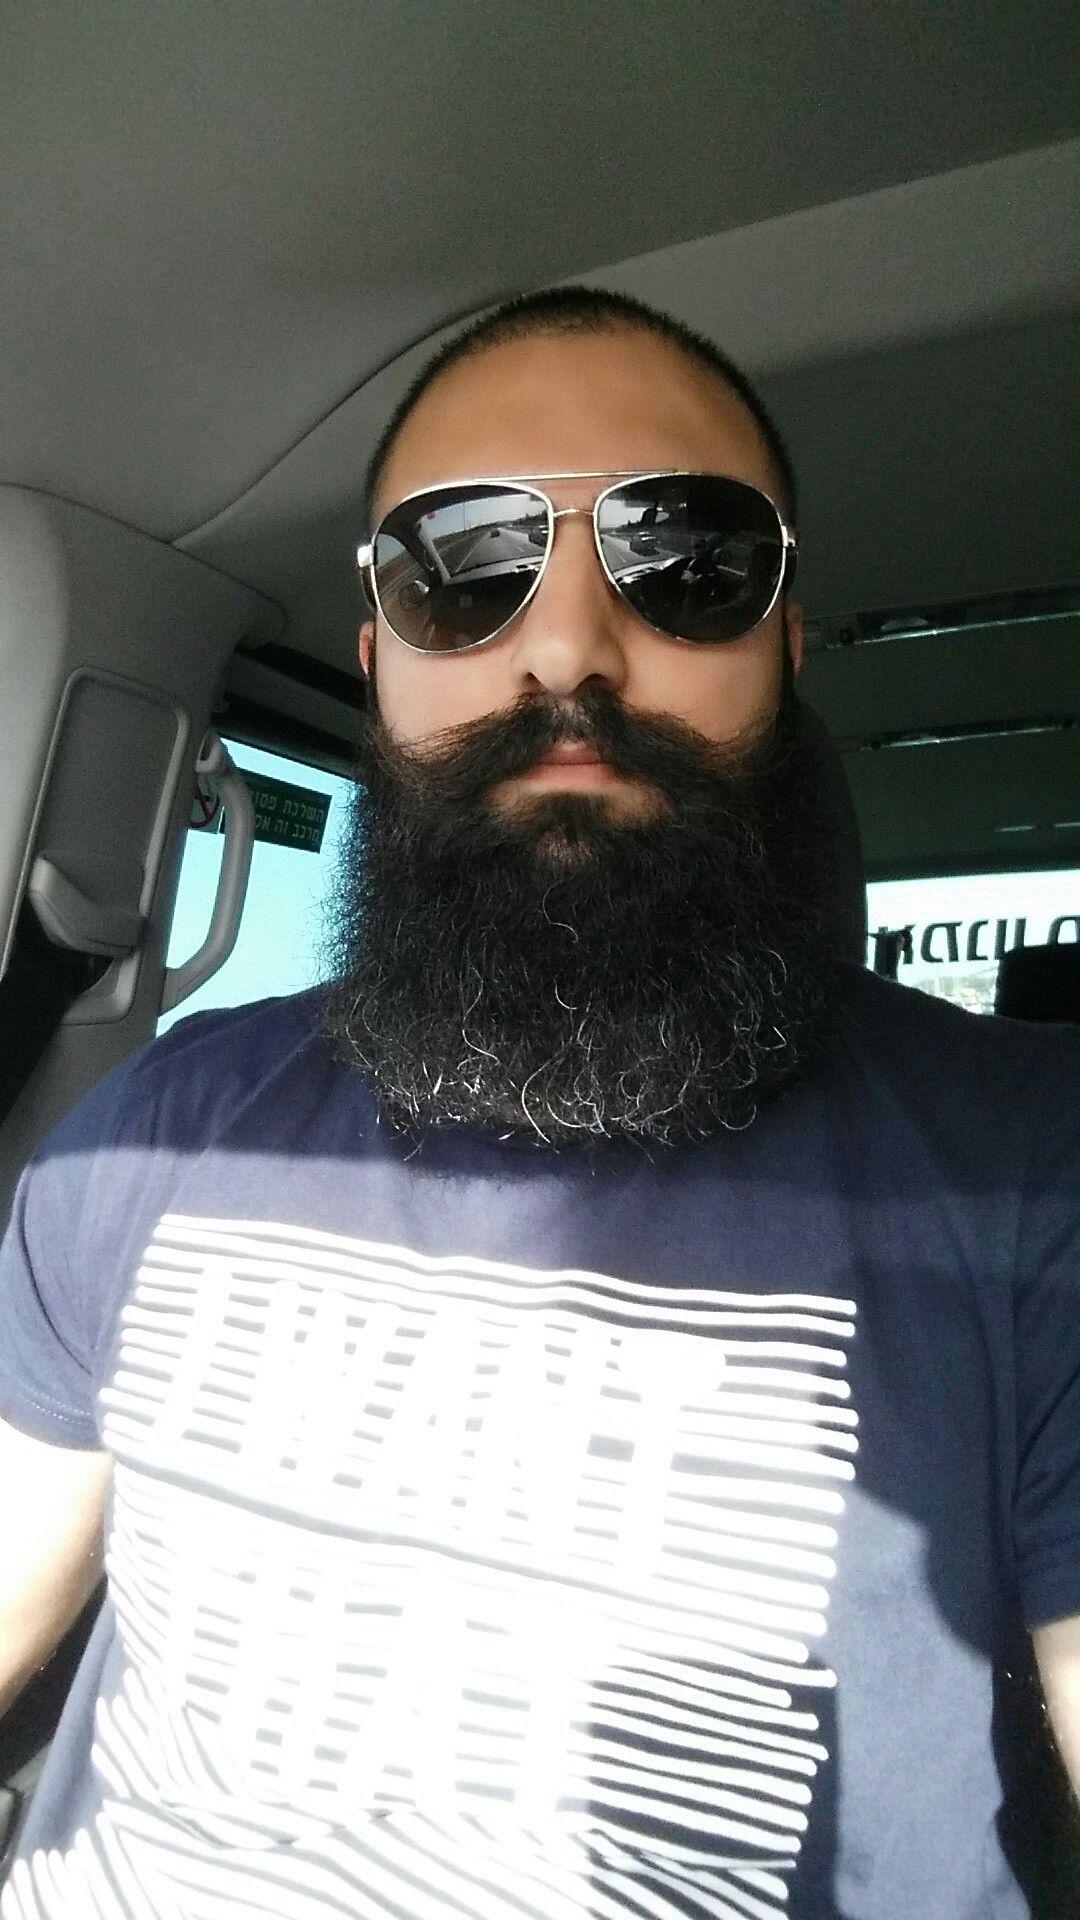 My Beard - Acre, Israel 05.2016